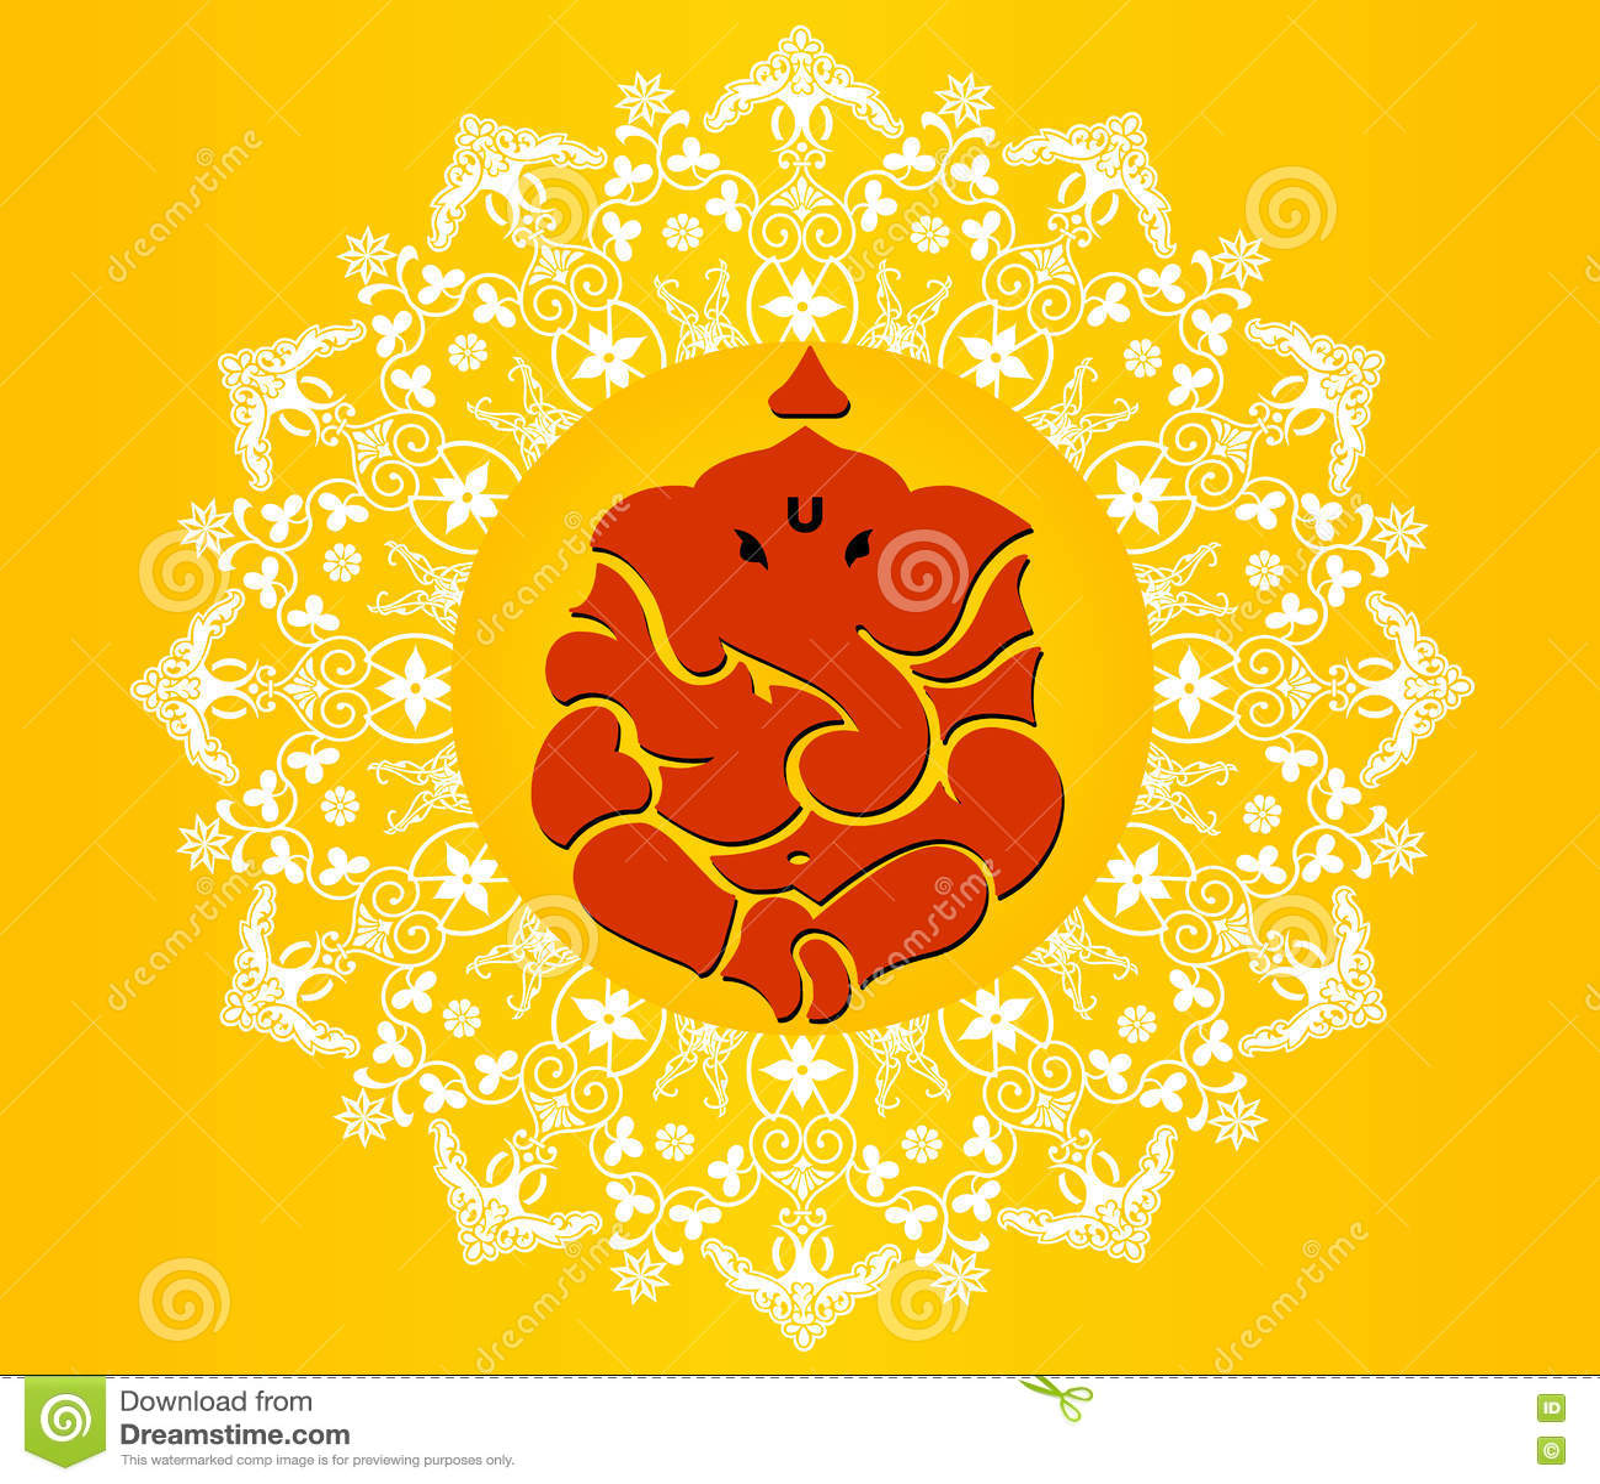 Indian god ganesha ganesh chaturthi card in vibrant colors stock indian god ganesha ganesh chaturthi card in vibrant colors buycottarizona